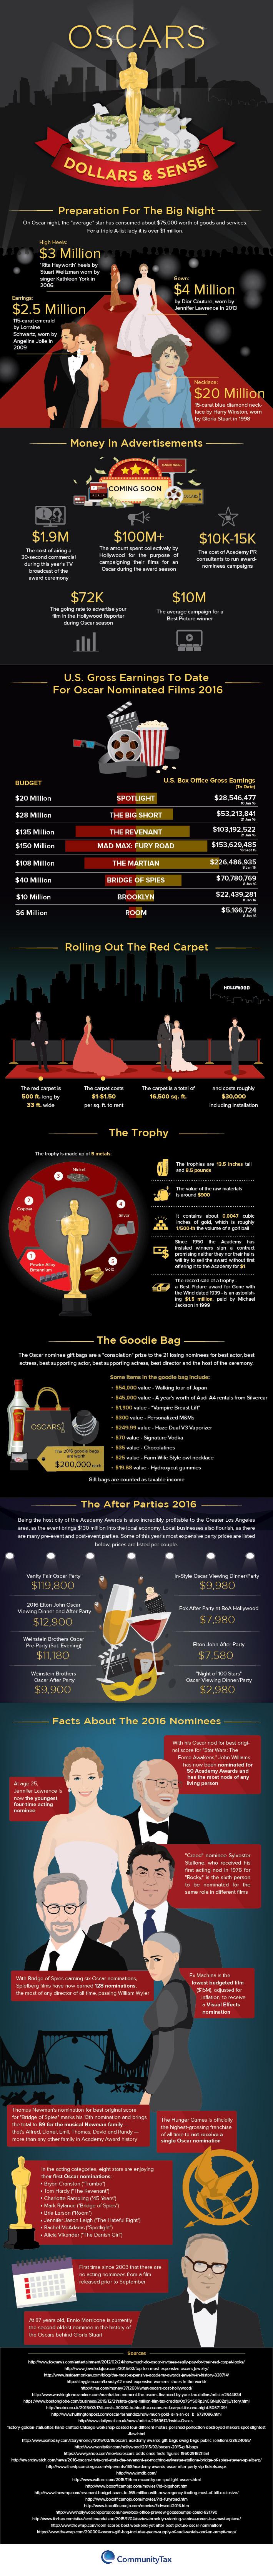 oscars-dollars-sense-infographic